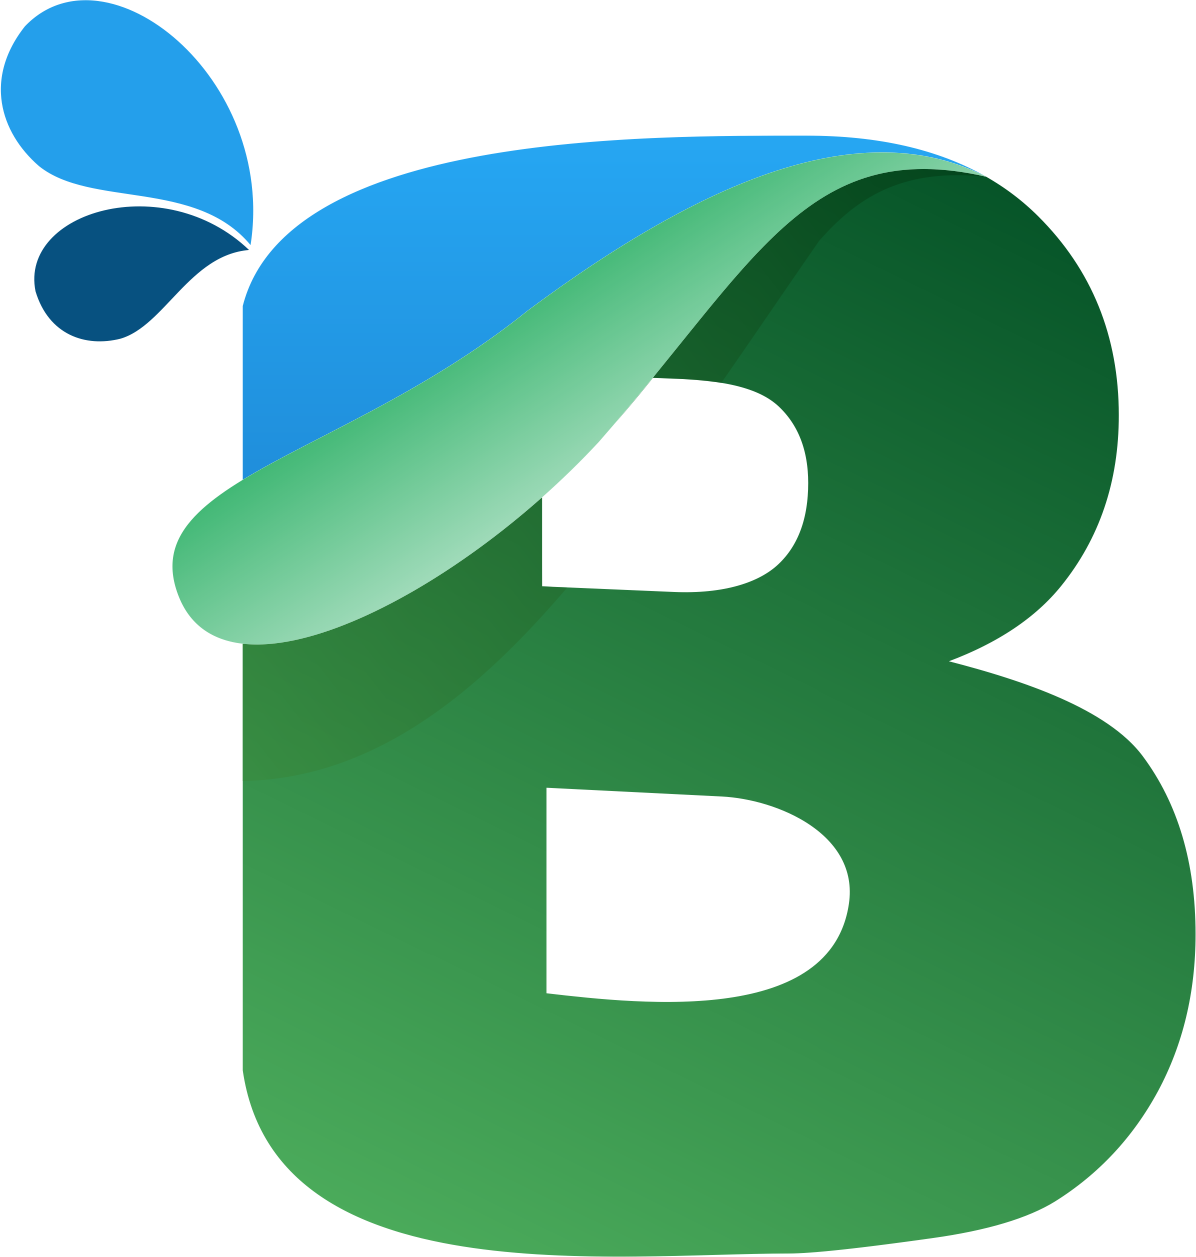 mtc tutorials download letter b logo design for free